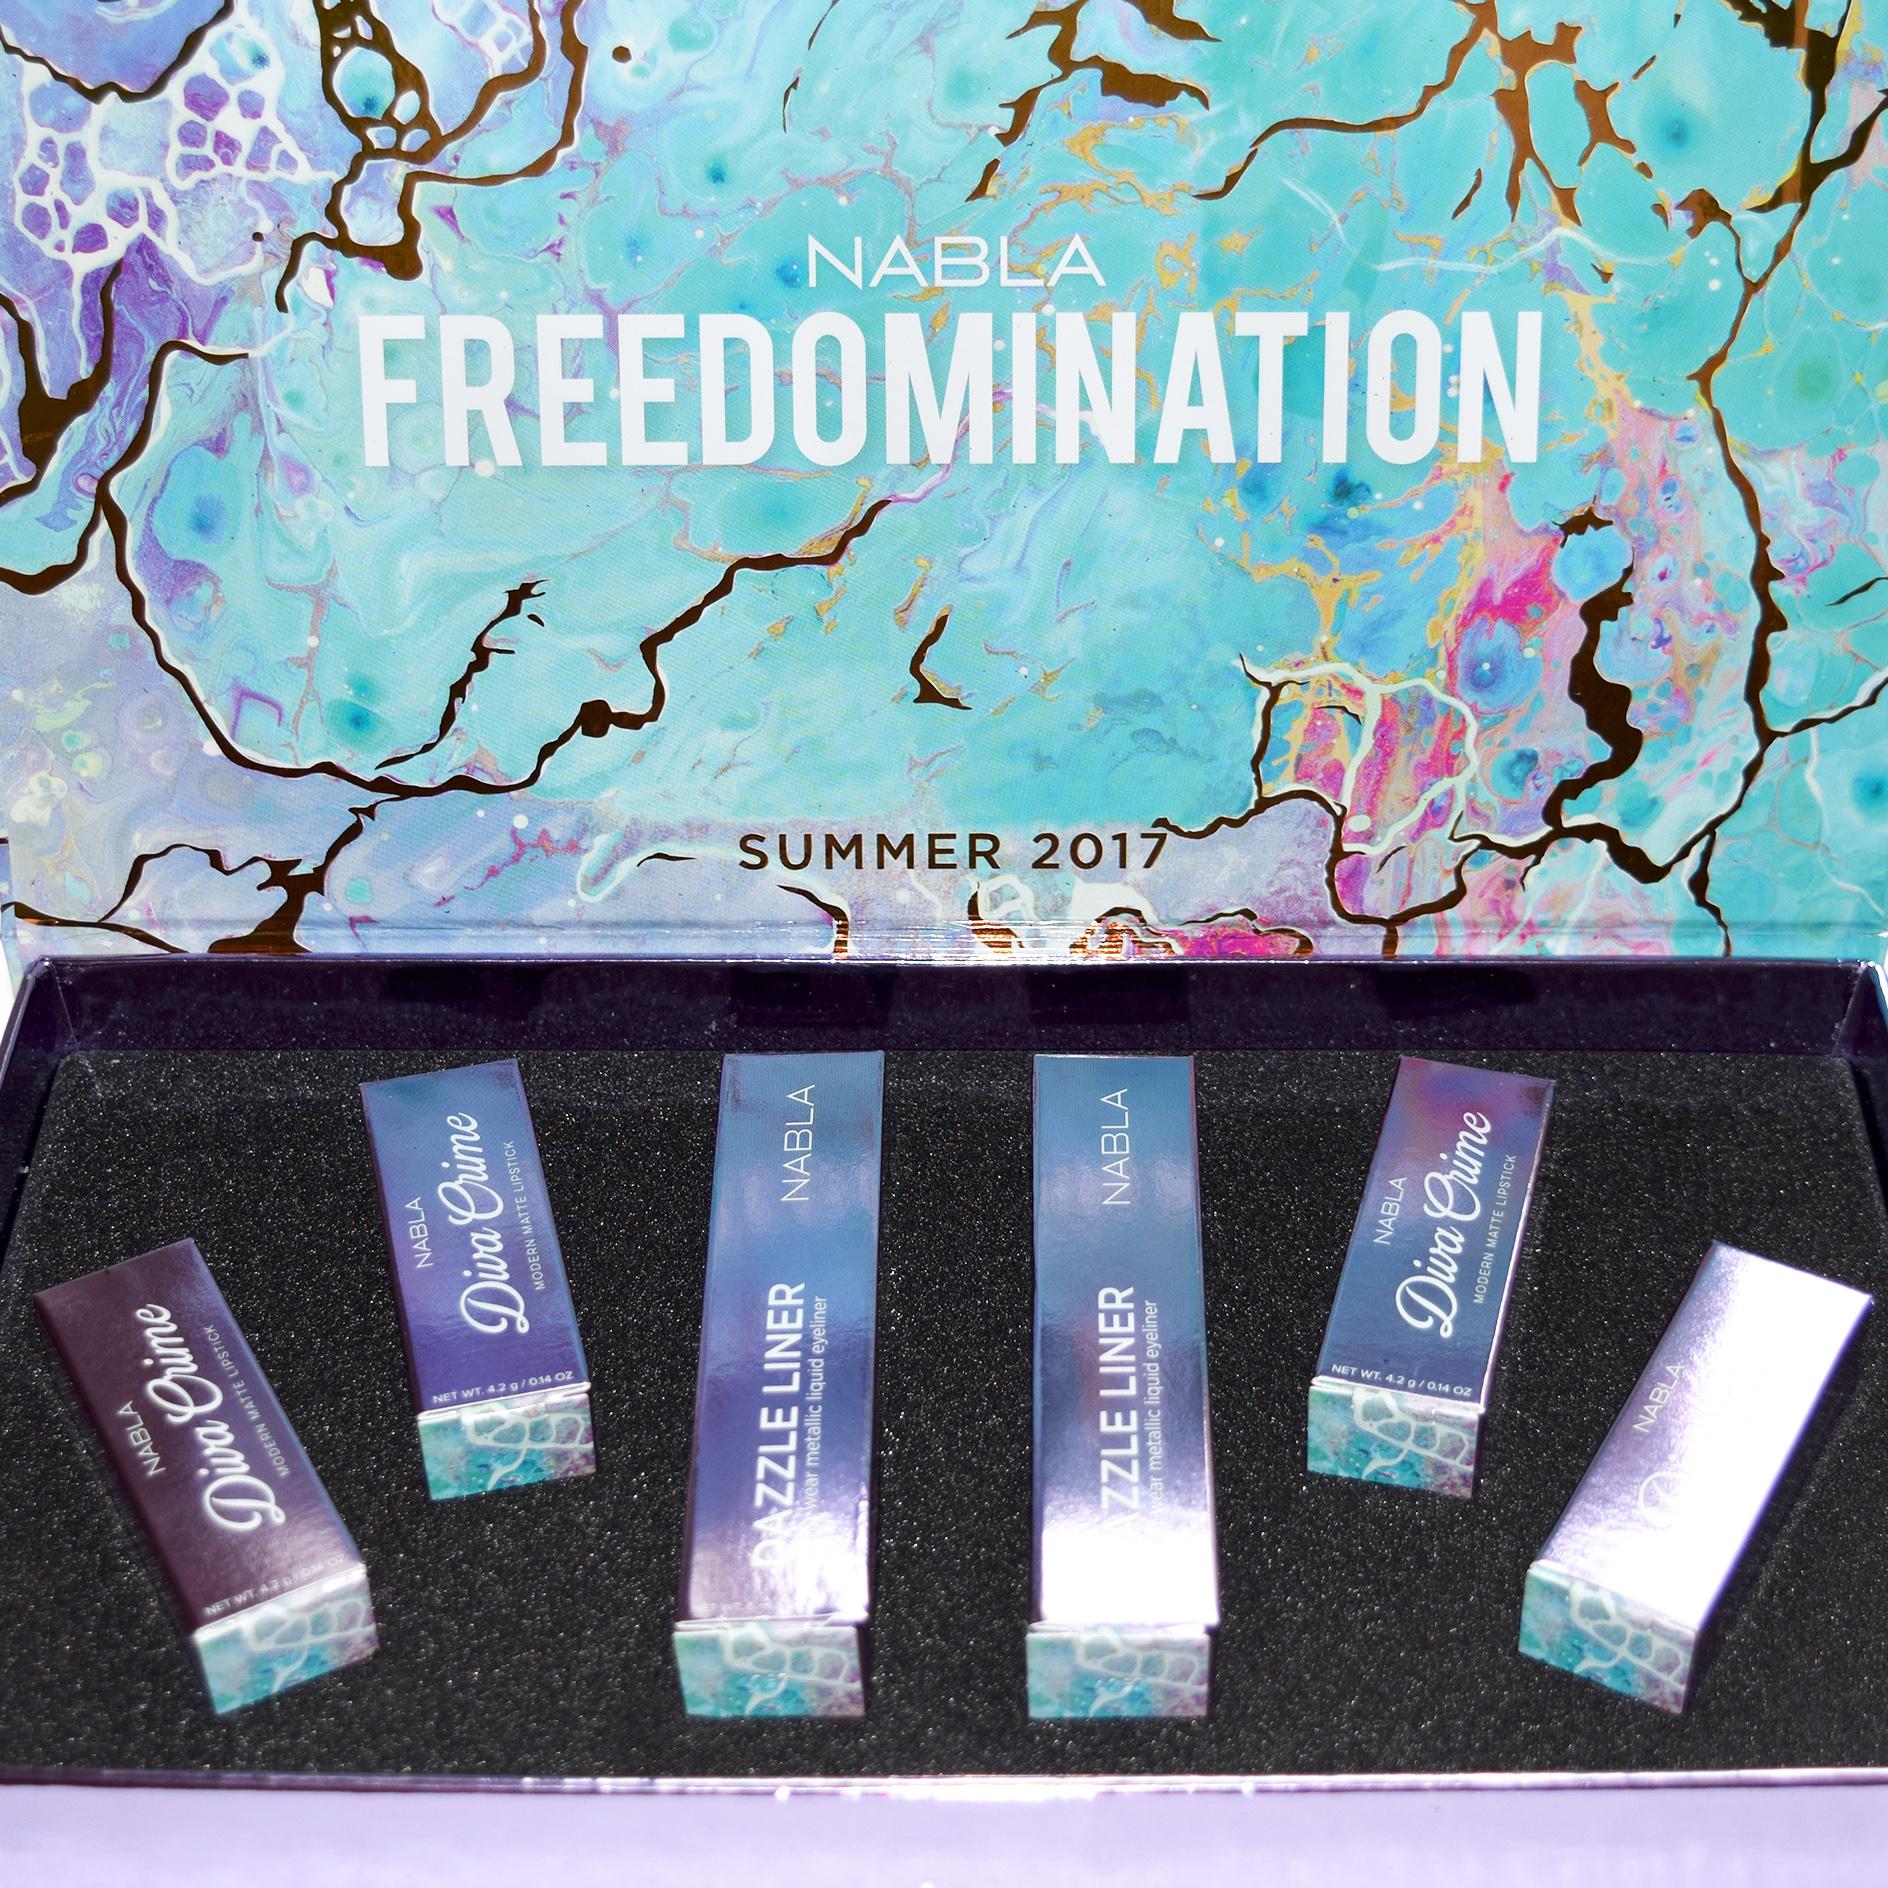 Nabla Freedomination Collection